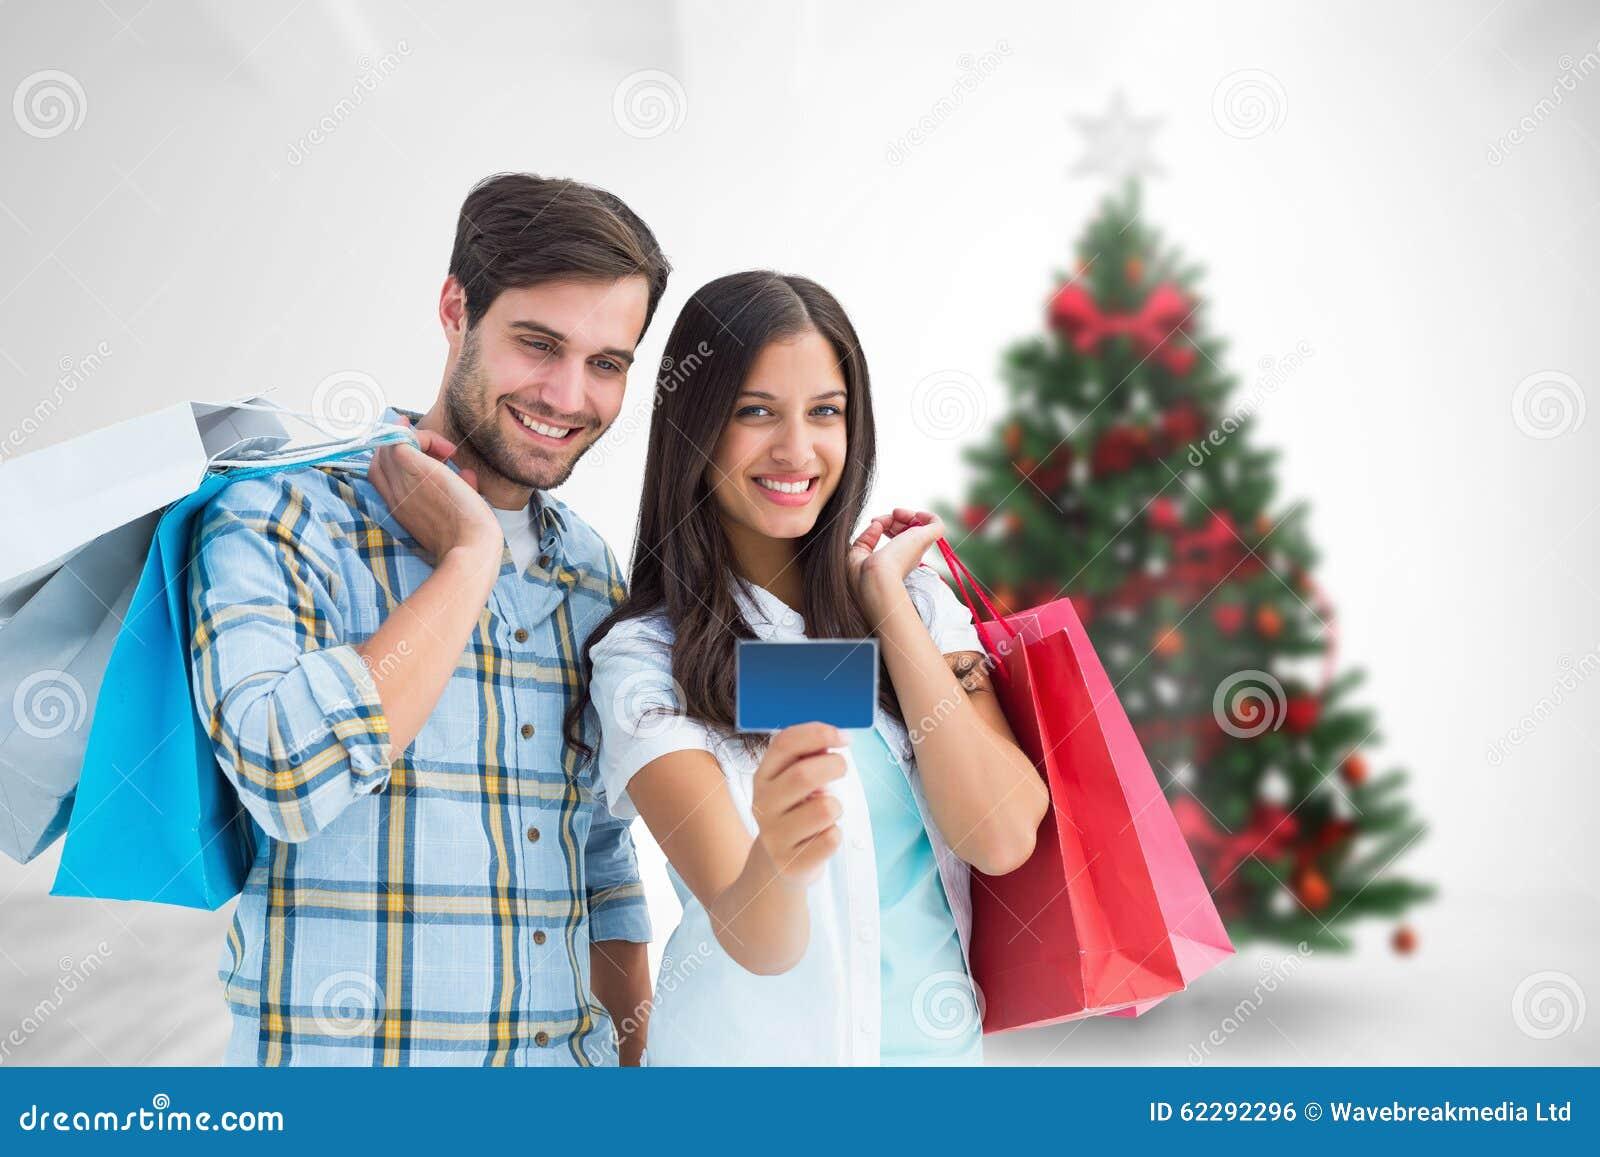 Couple dresses online shopping